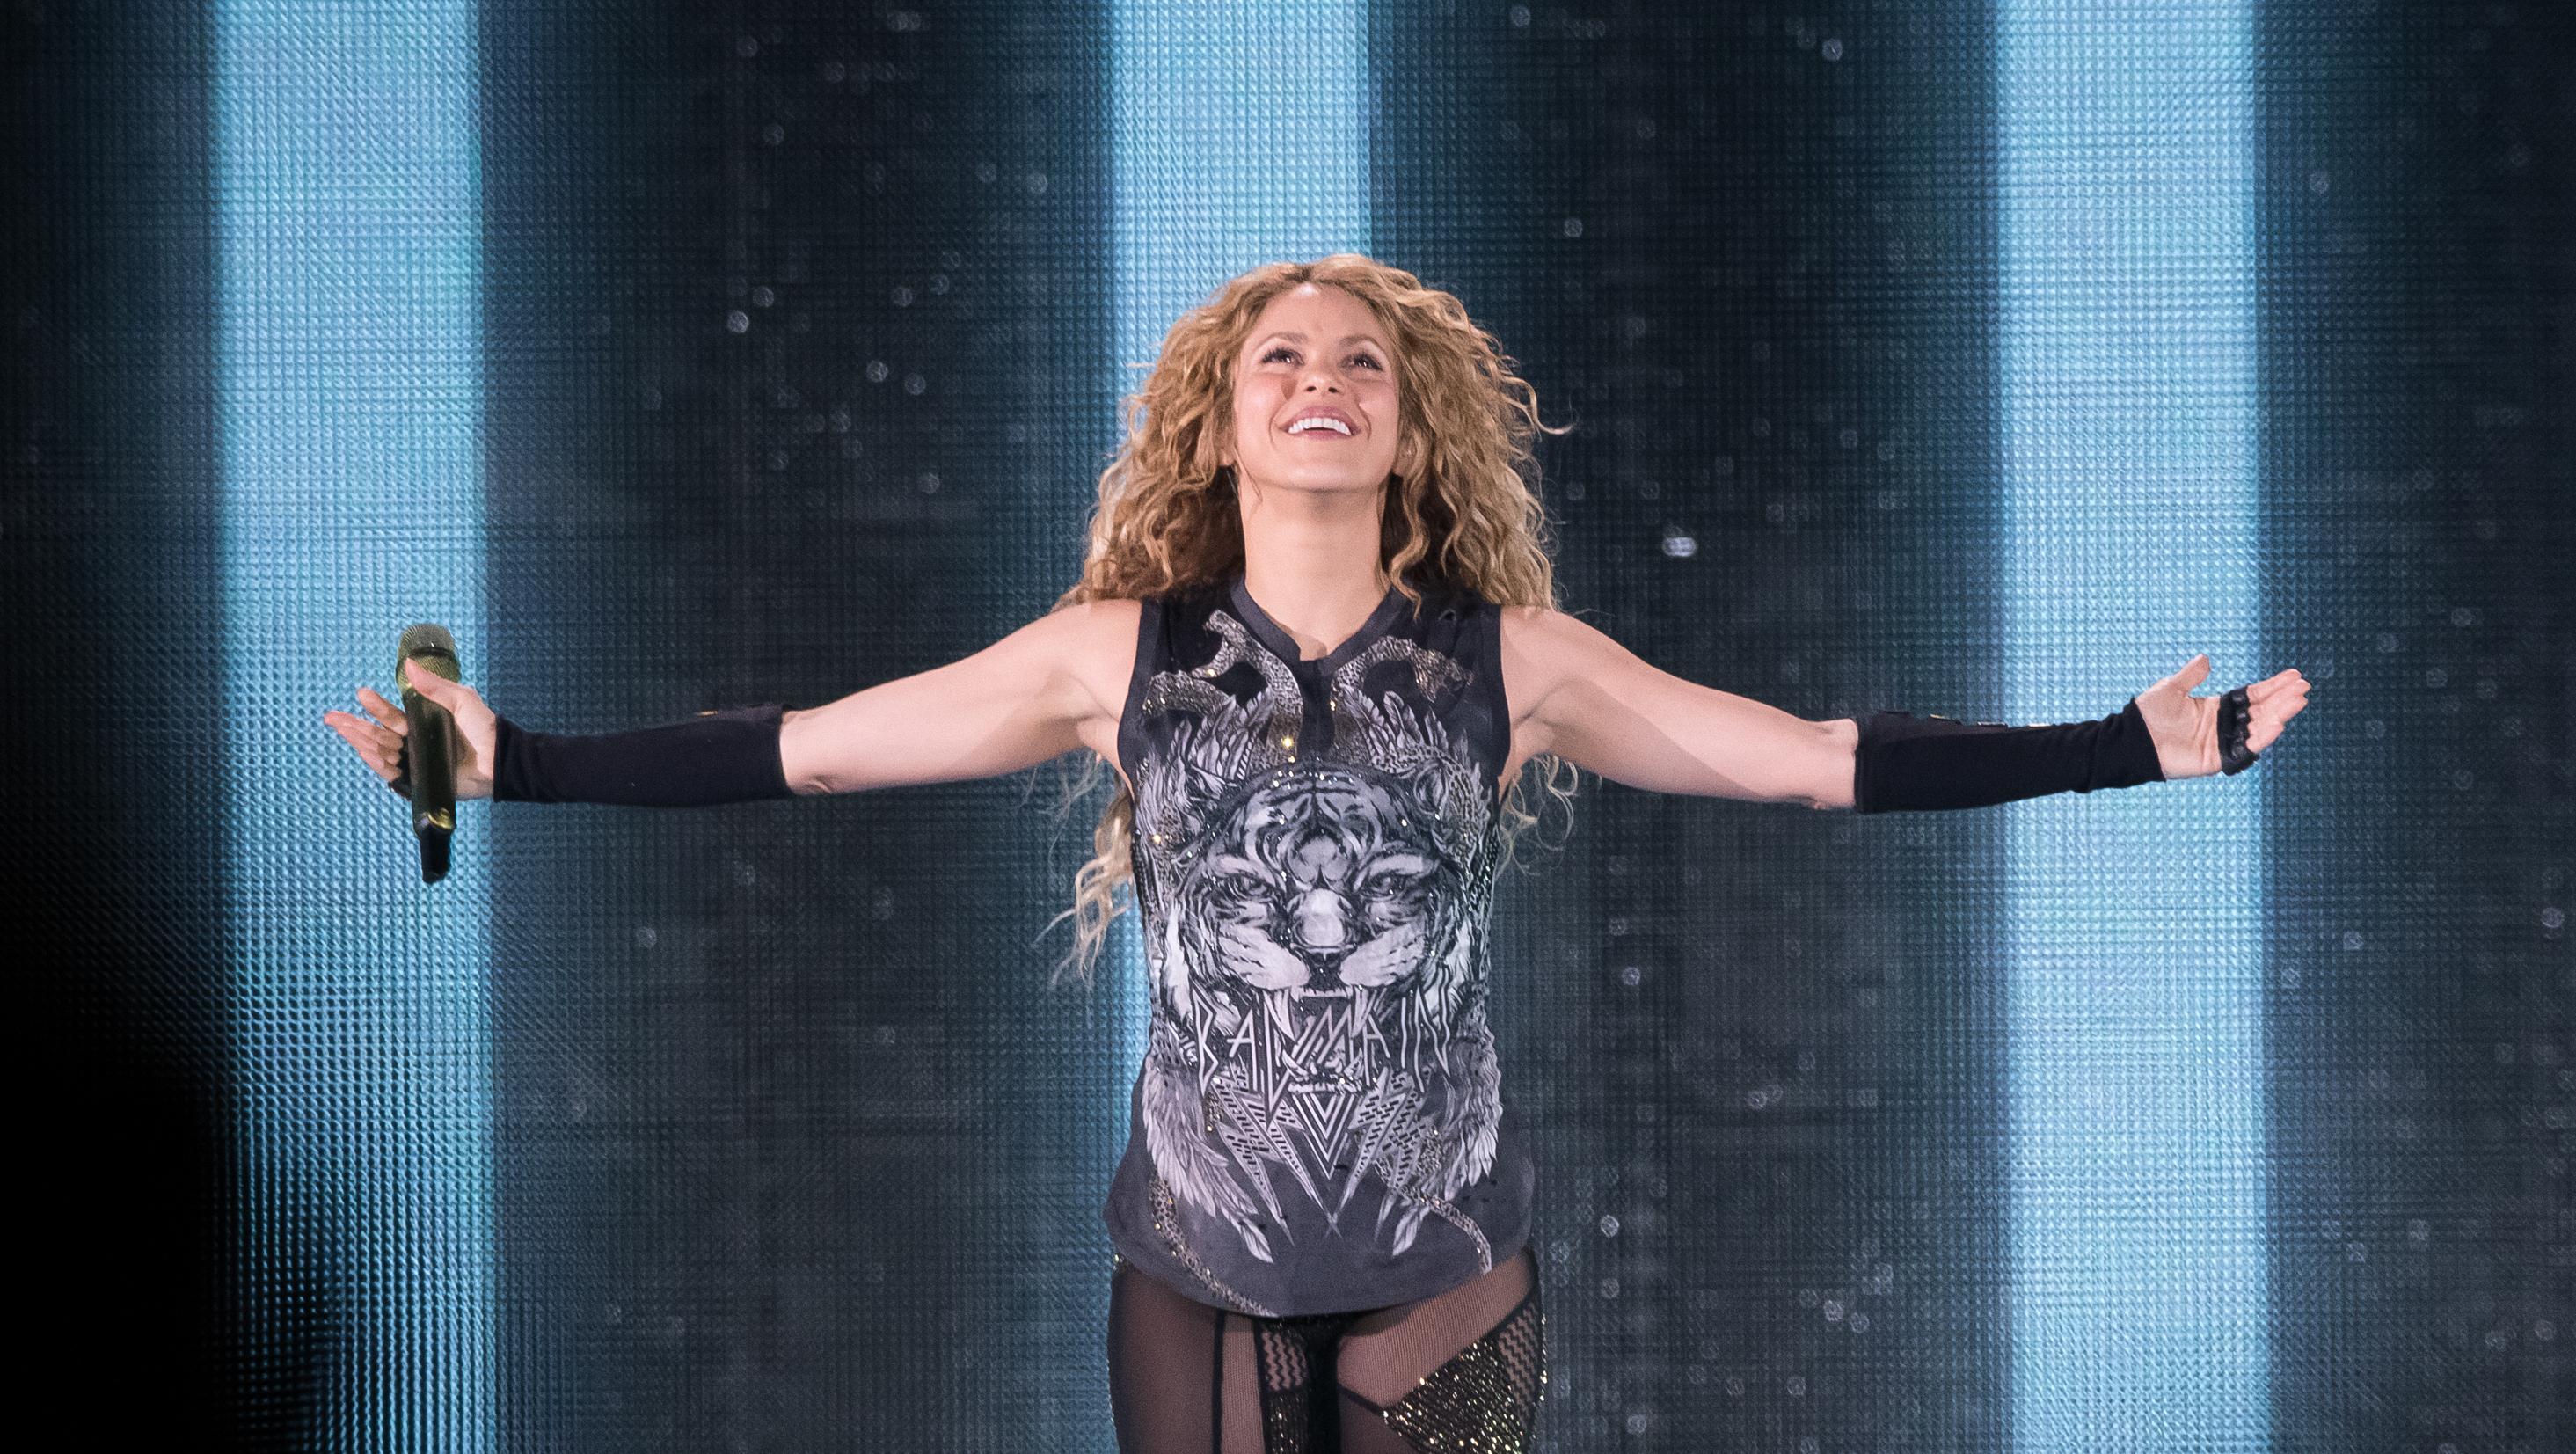 JLo & Shakira Will Headline the 2020 Super Bowl Halftime Show